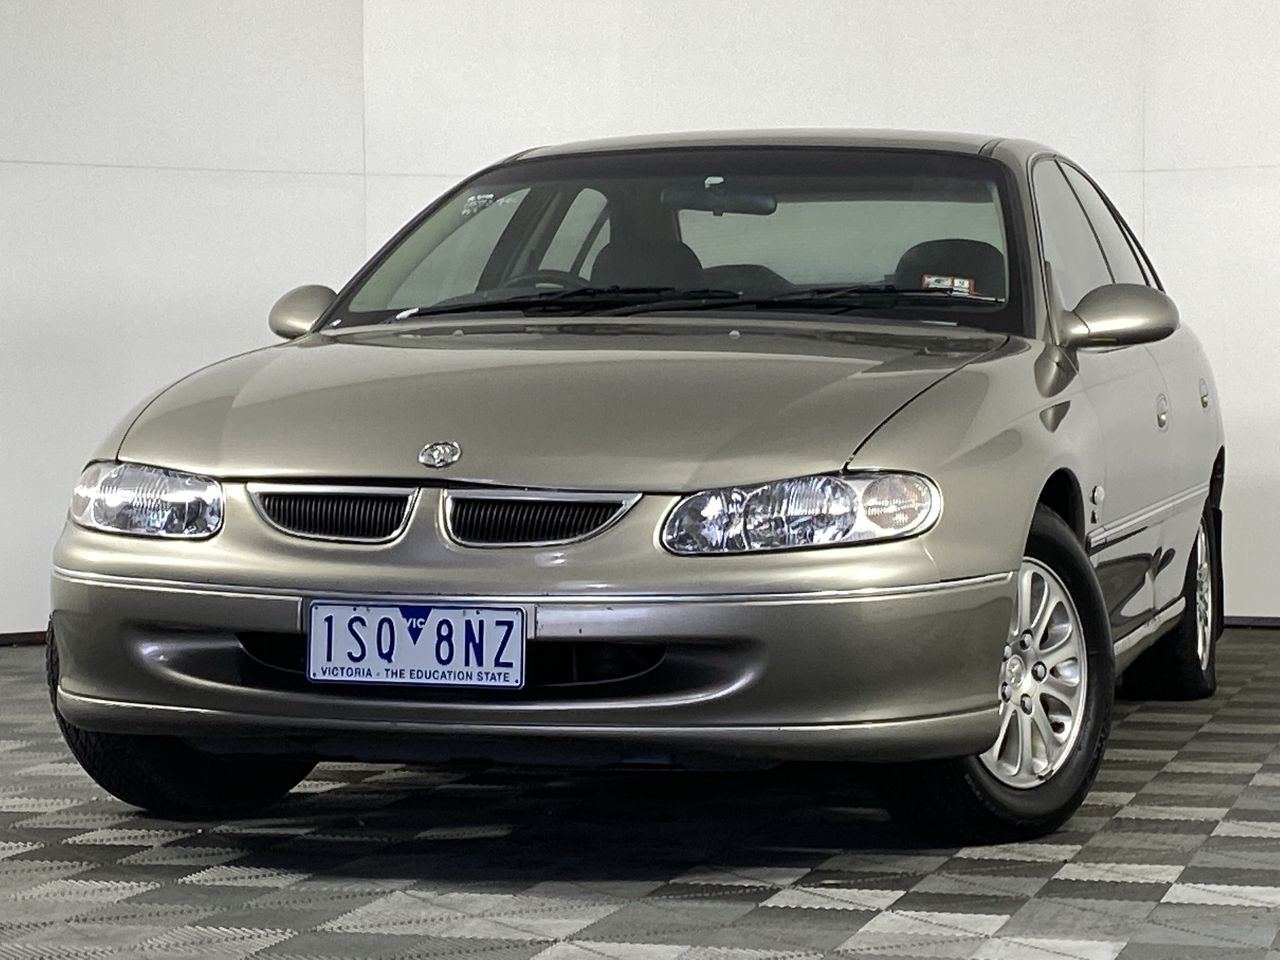 1999 Holden Commodore Berlina VT Automatic Sedan